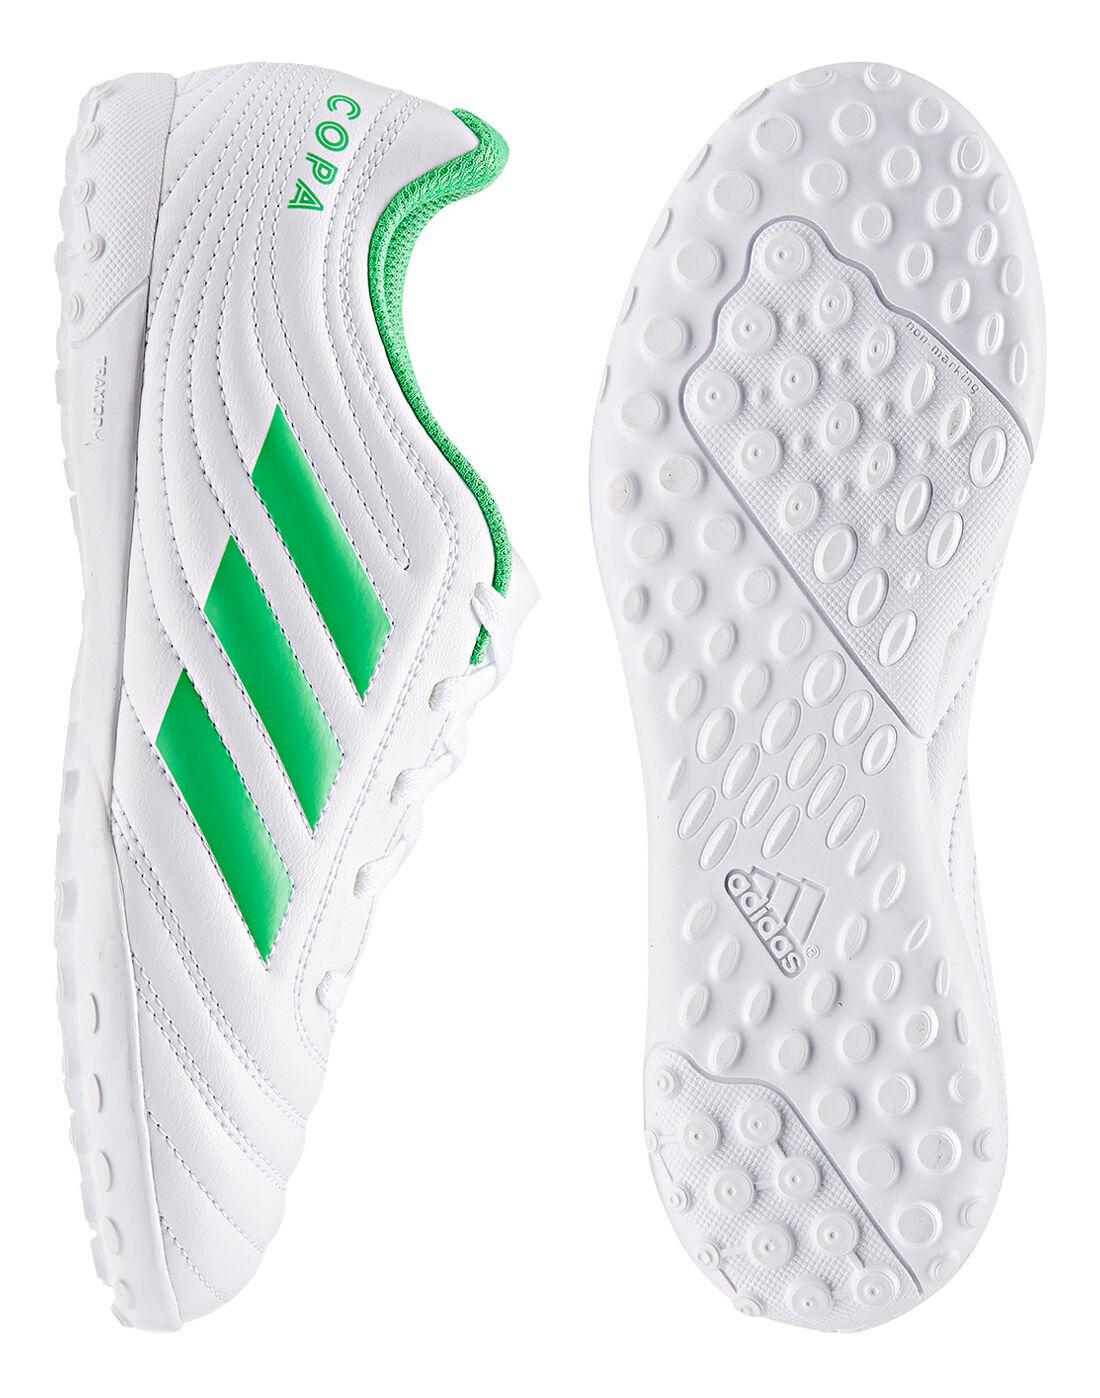 Kid's Green \u0026 White adidas Copa 19.4